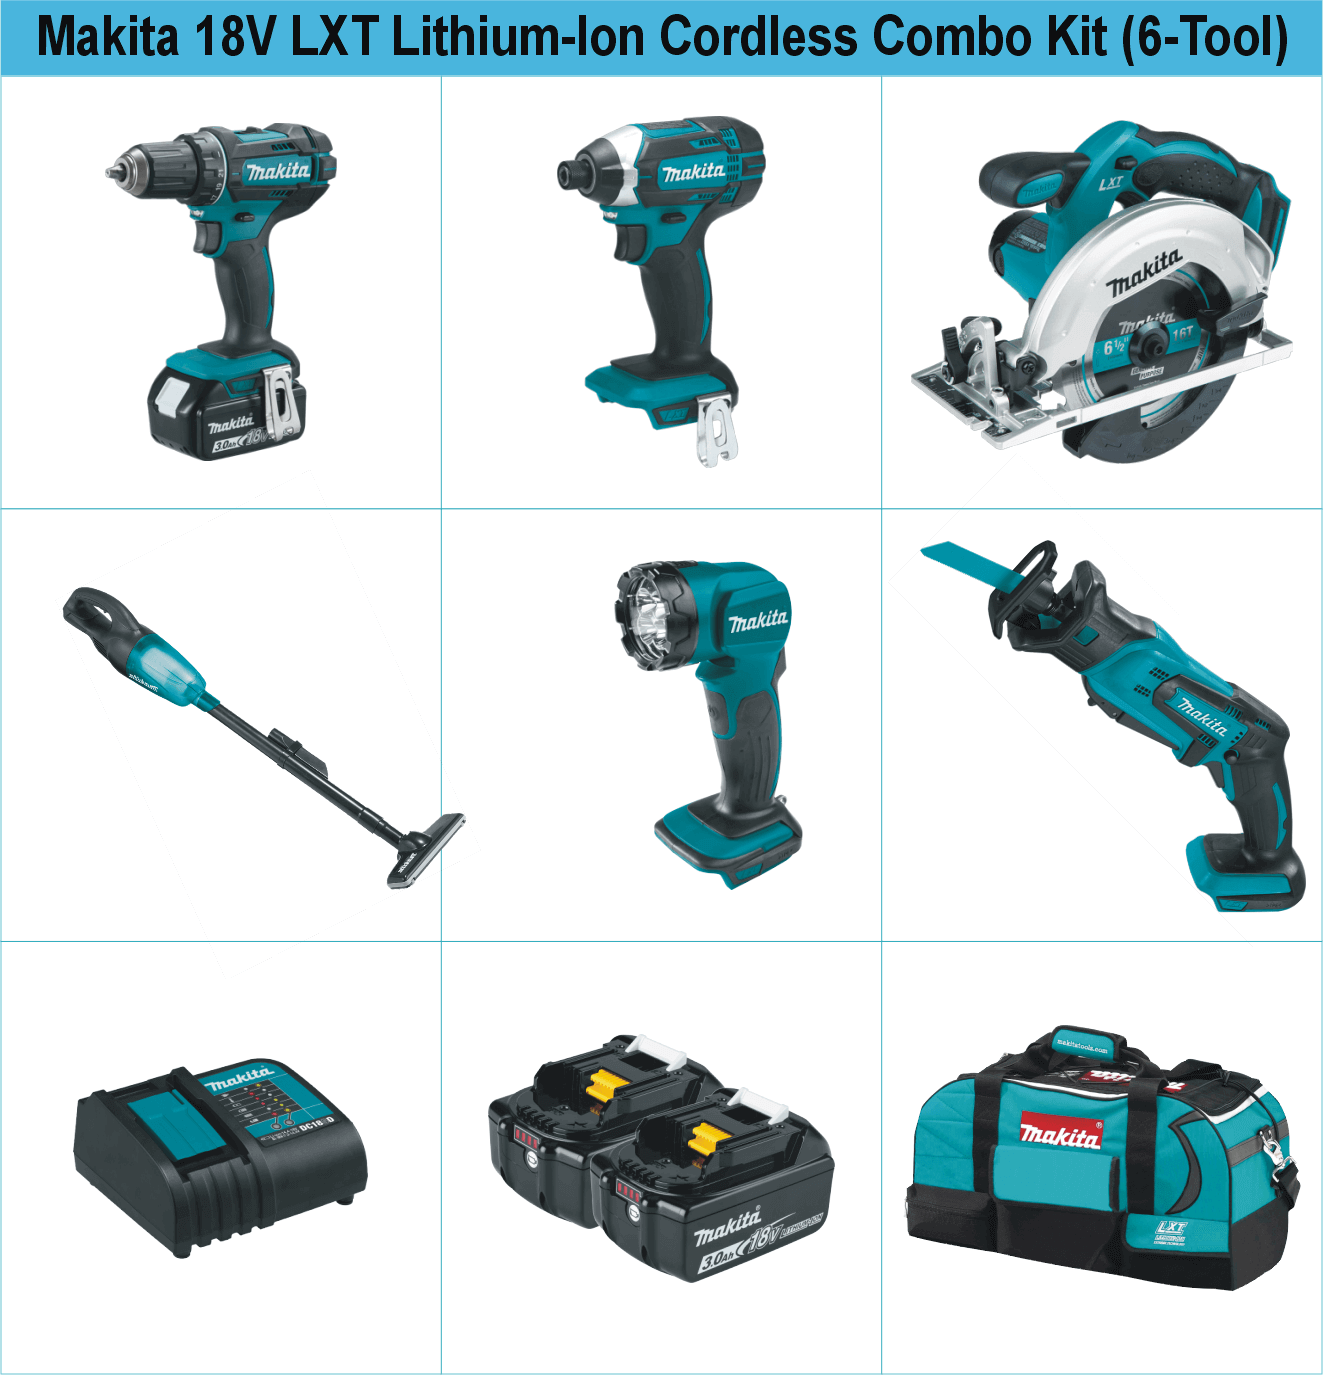 makita-18v-lxt-lithium-ion-cordless-combo-kit-6-tool